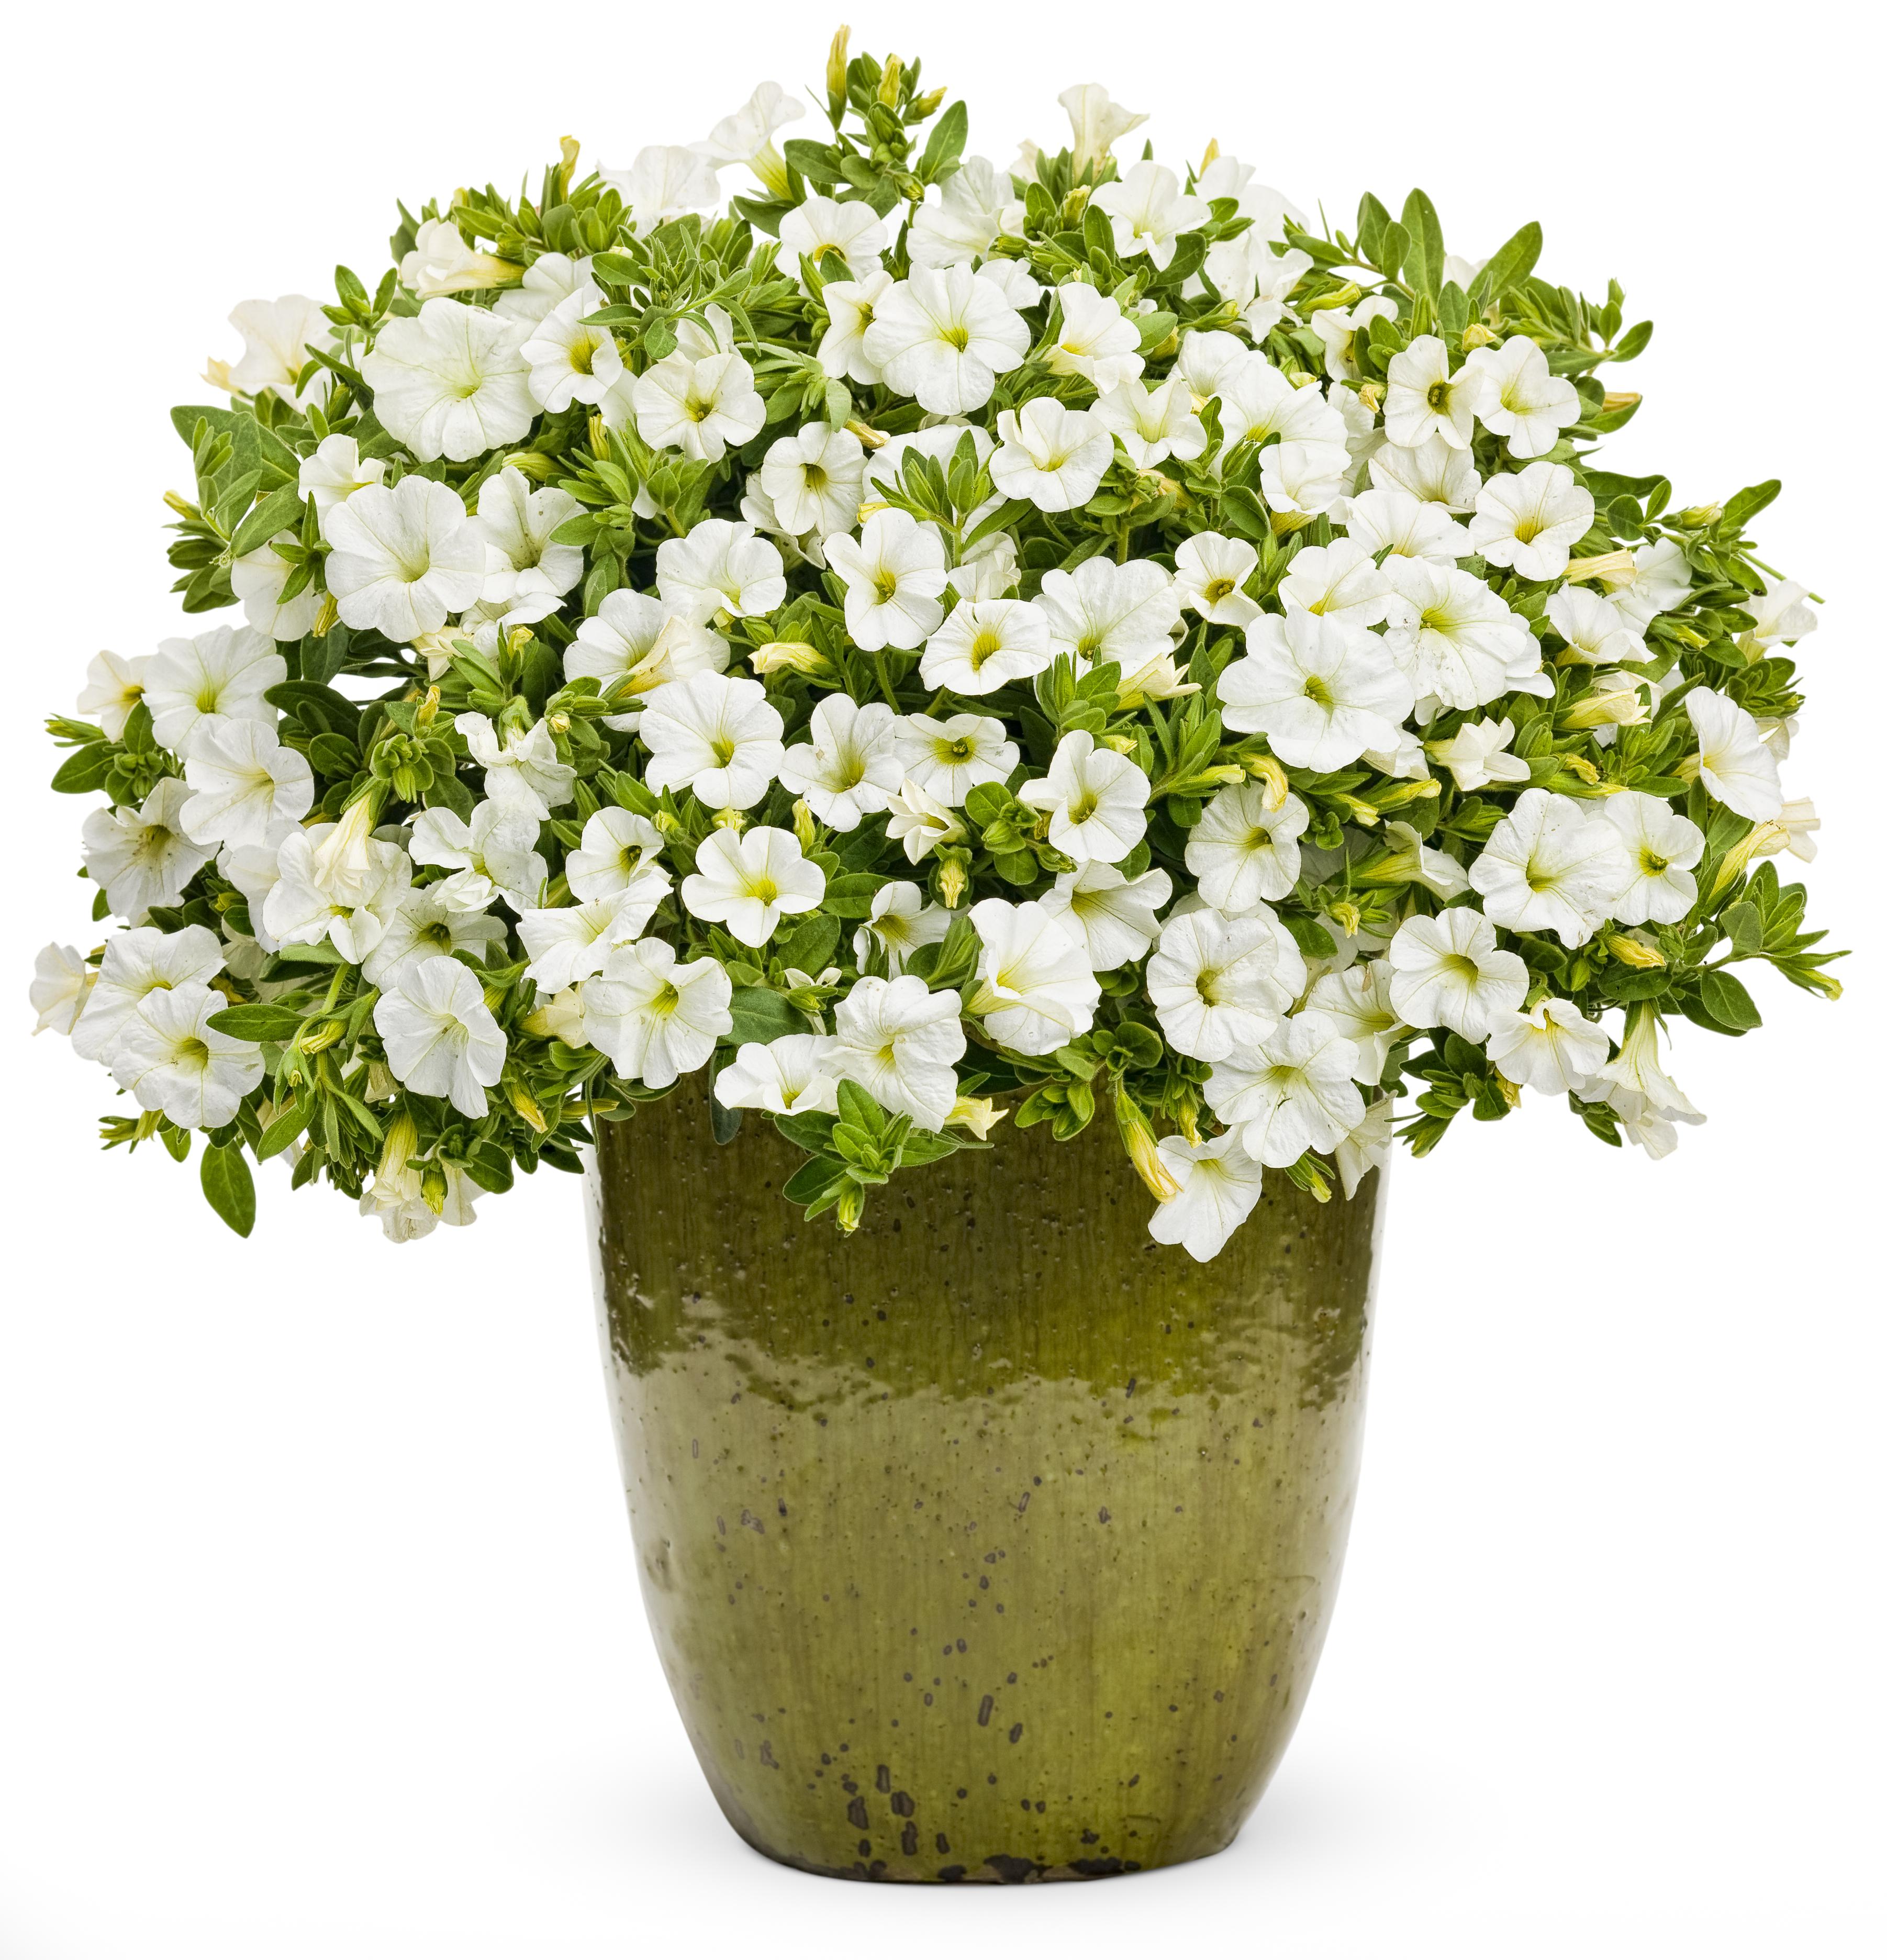 Flower Pot Png - Flower Pots With Flowers Png Flower Pot Pla, Transparent background PNG HD thumbnail